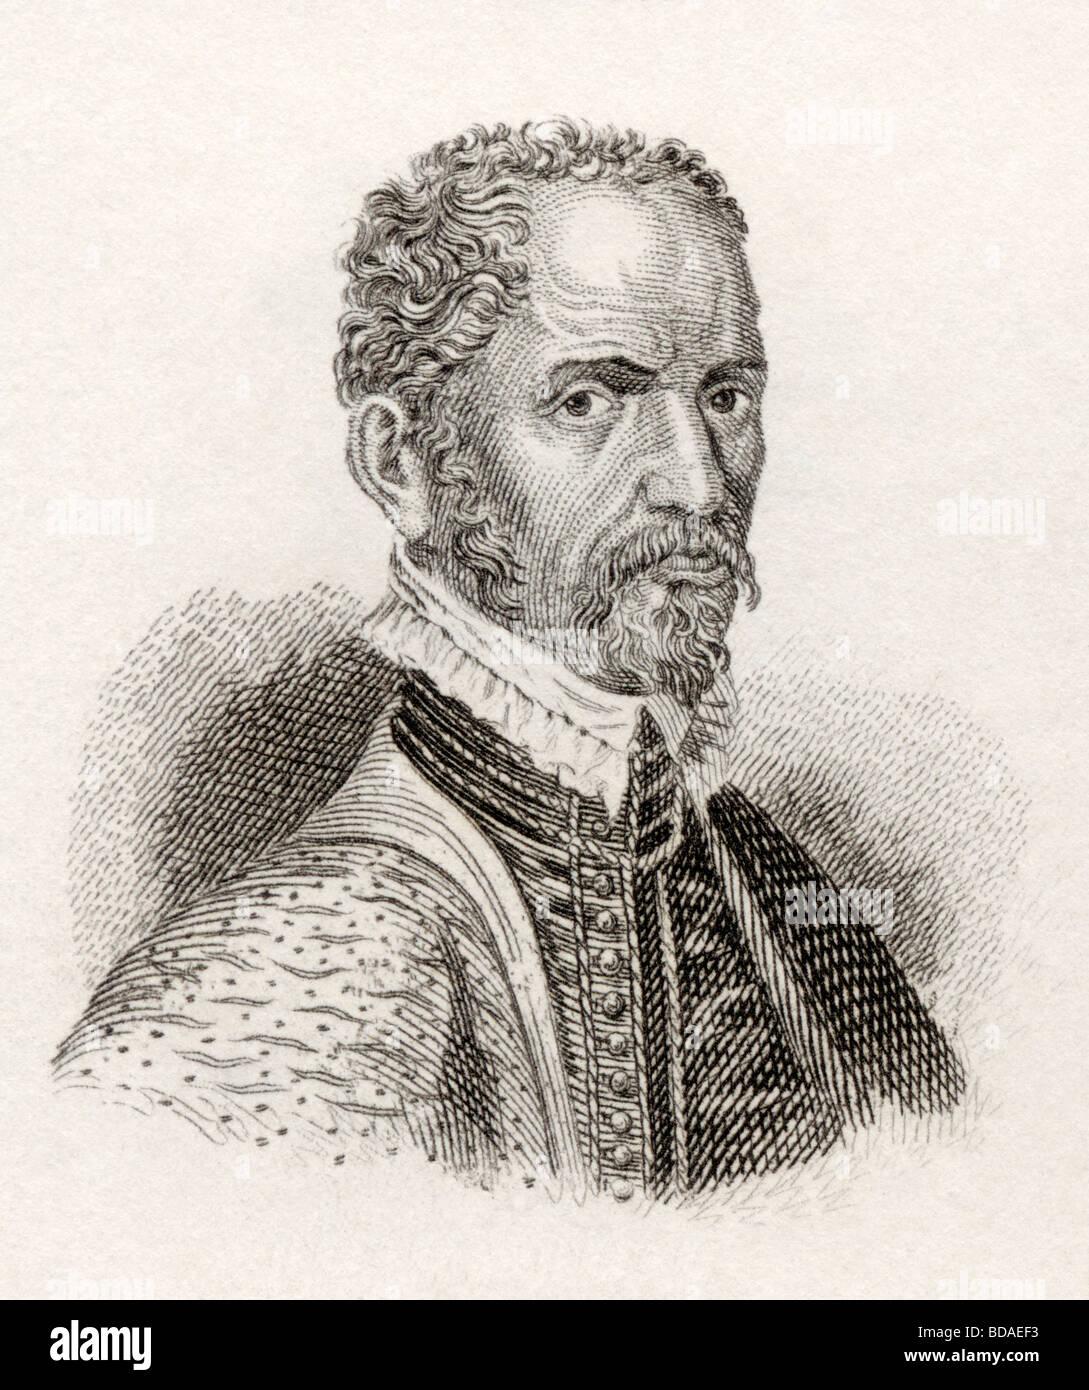 Hubert Goltz aka Hubertus Goltzius 1526 to 1583.  Flemish humanist printmaker, publisher, painter and numismatist. - Stock Image